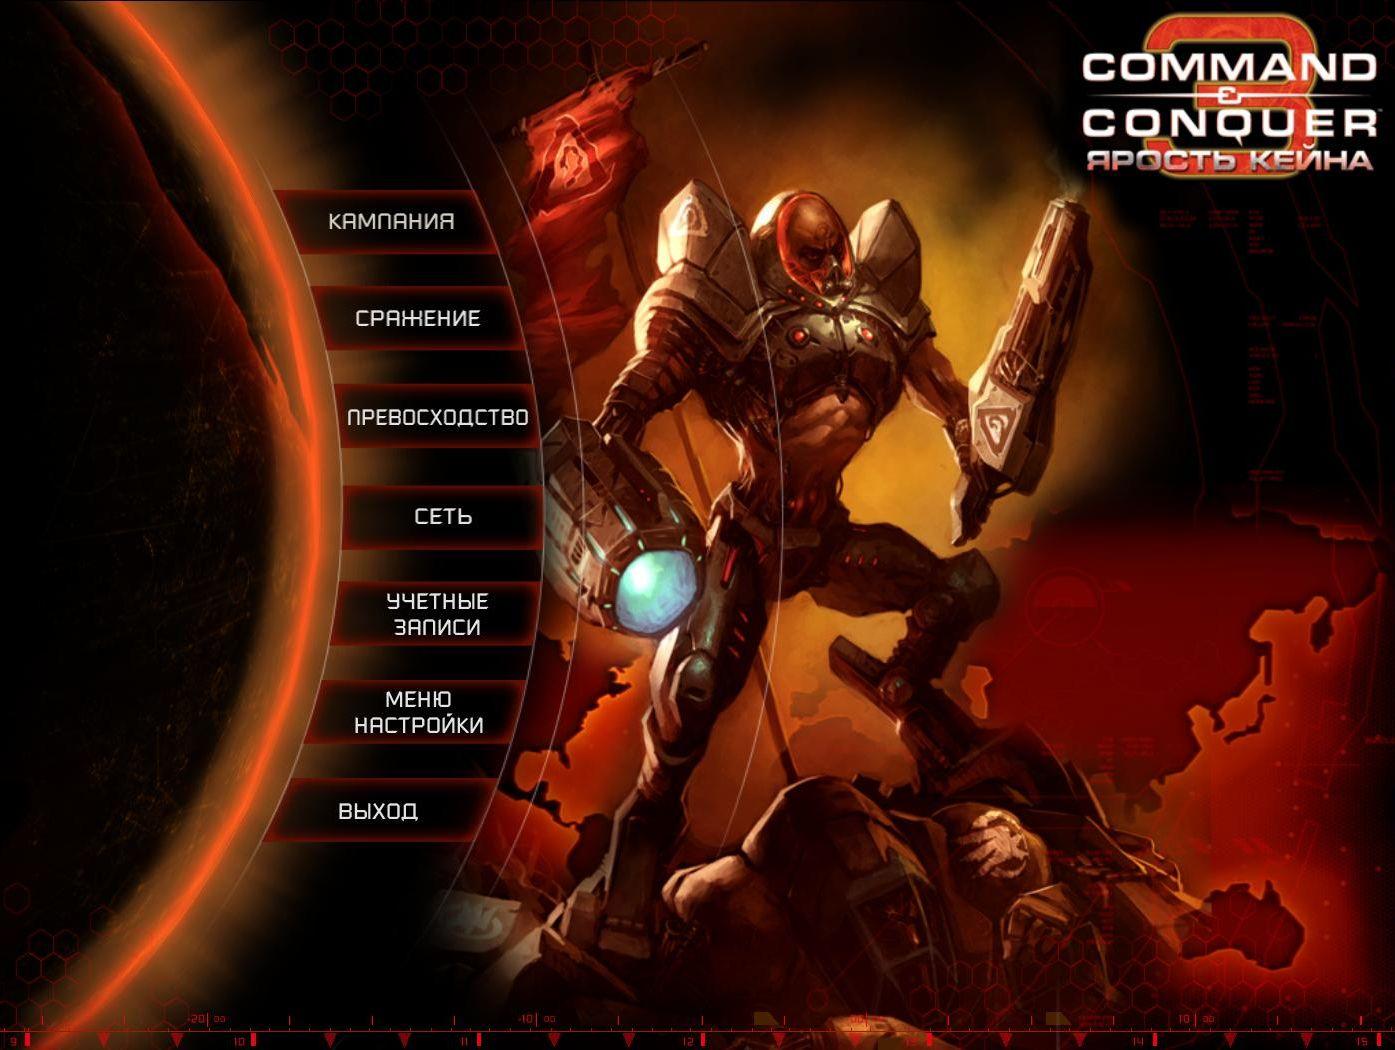 Command & Conquer 3 Kane's Wrath - Ярость Кейна (Рус) .